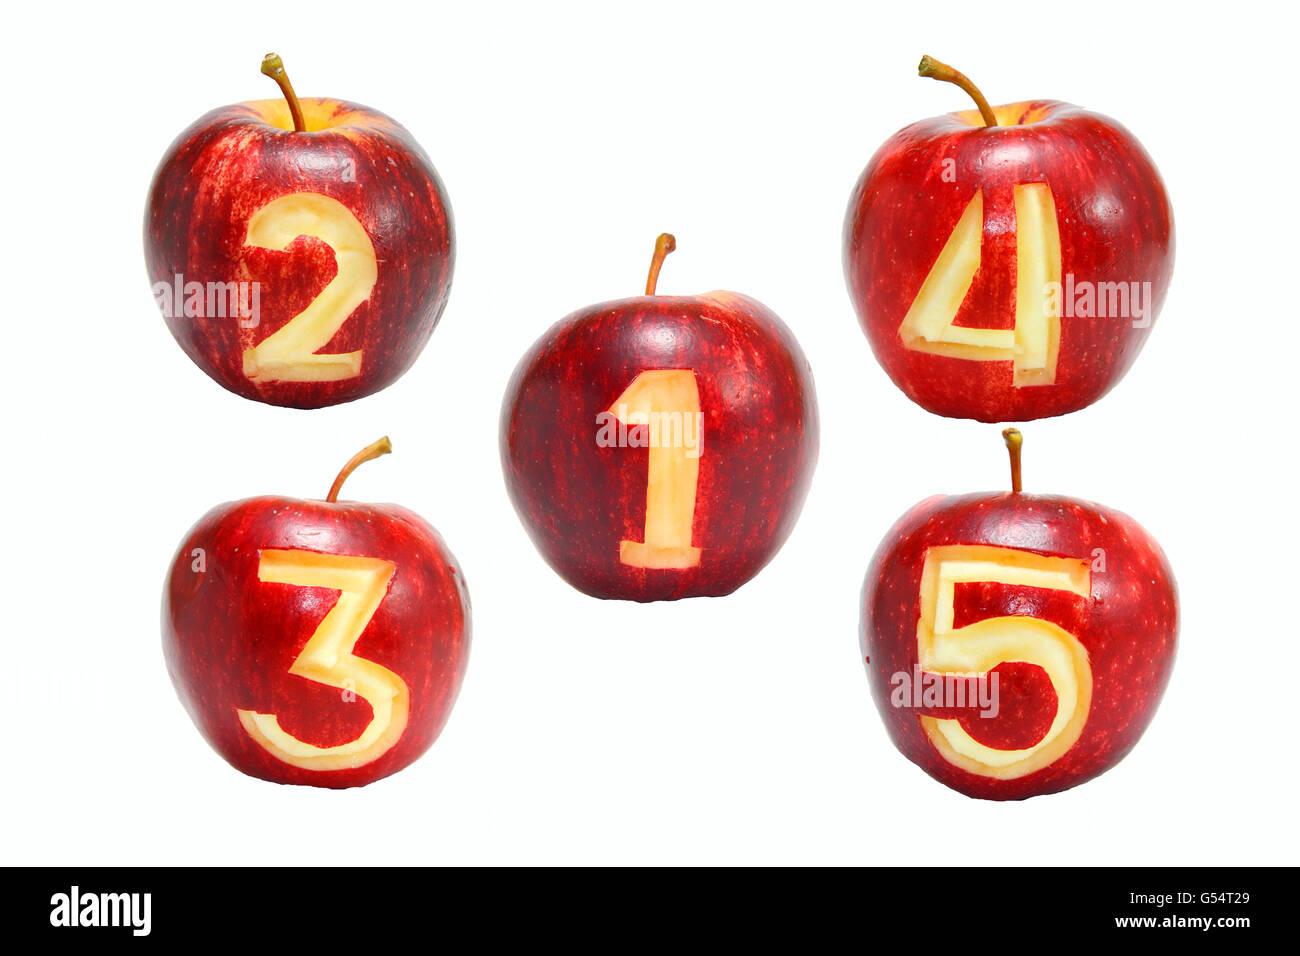 Nummer 1 bis 5 Symbol auf Äpfel Stockbild